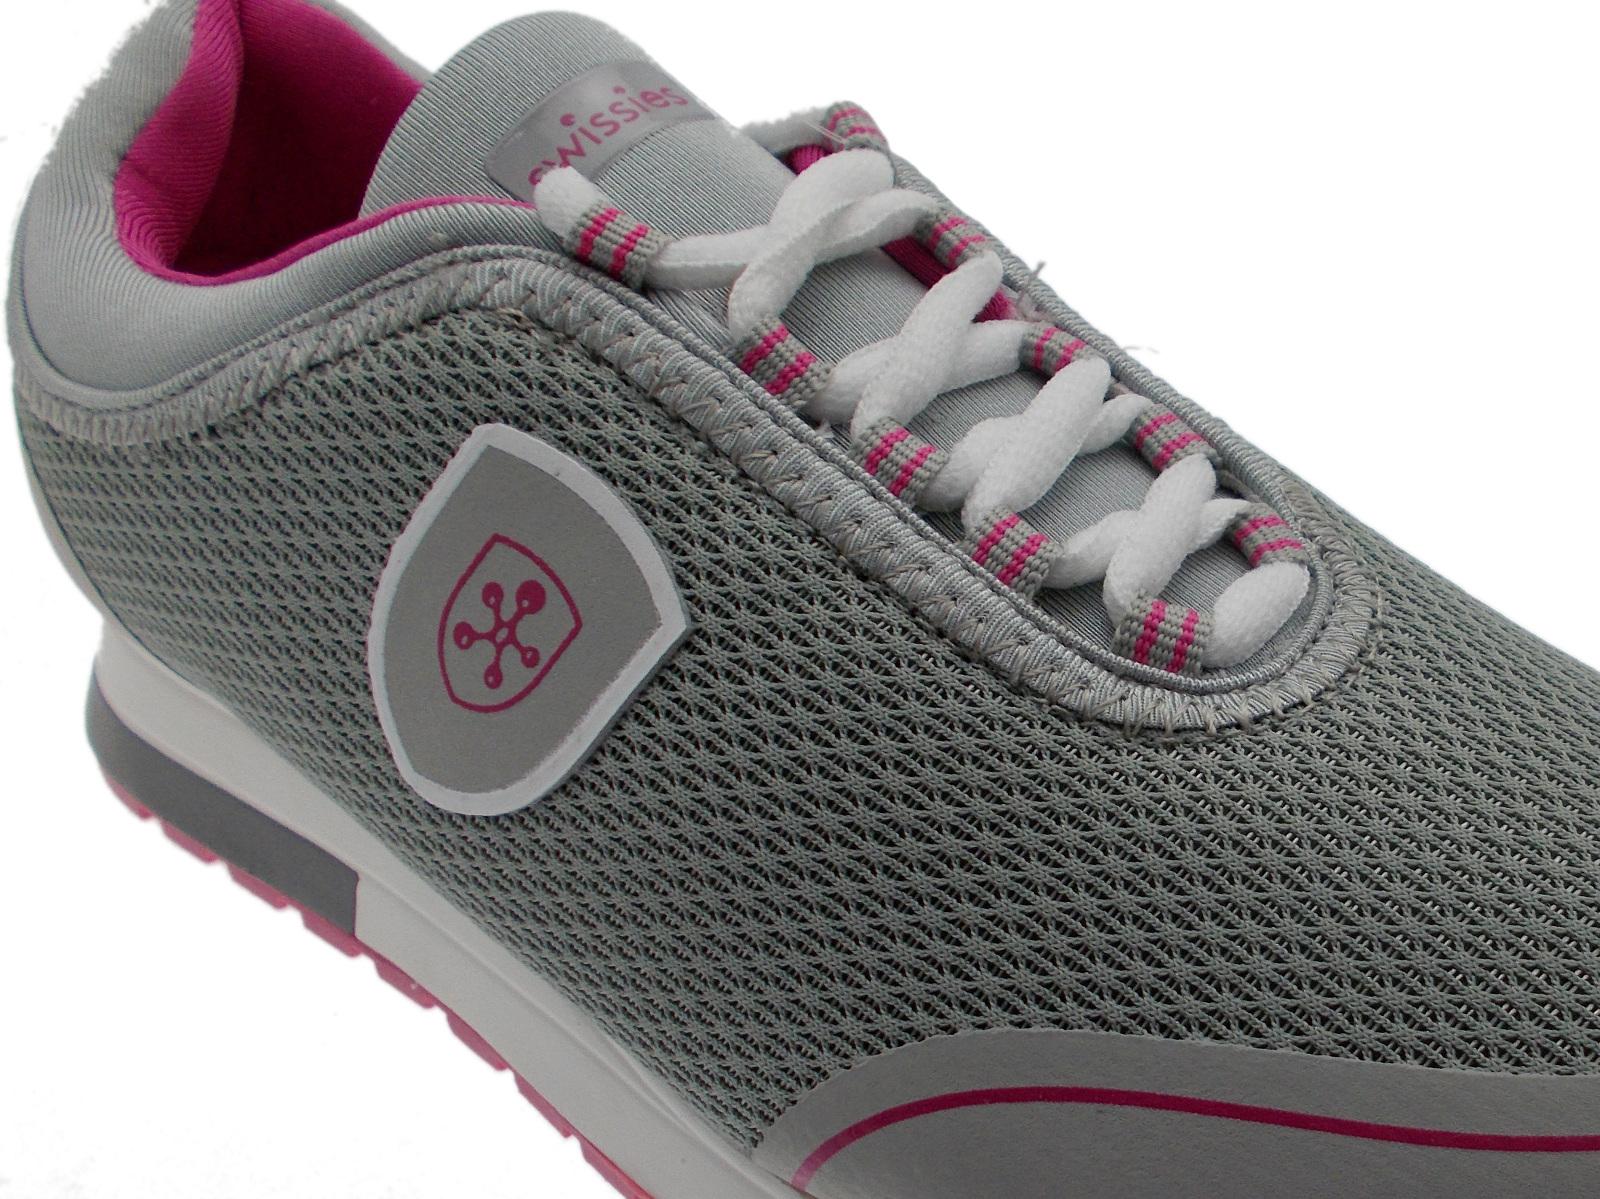 Swissies Sneaker Grigio Lacci Donna Tennis Art Scarpa Giada 6q5Zgw0